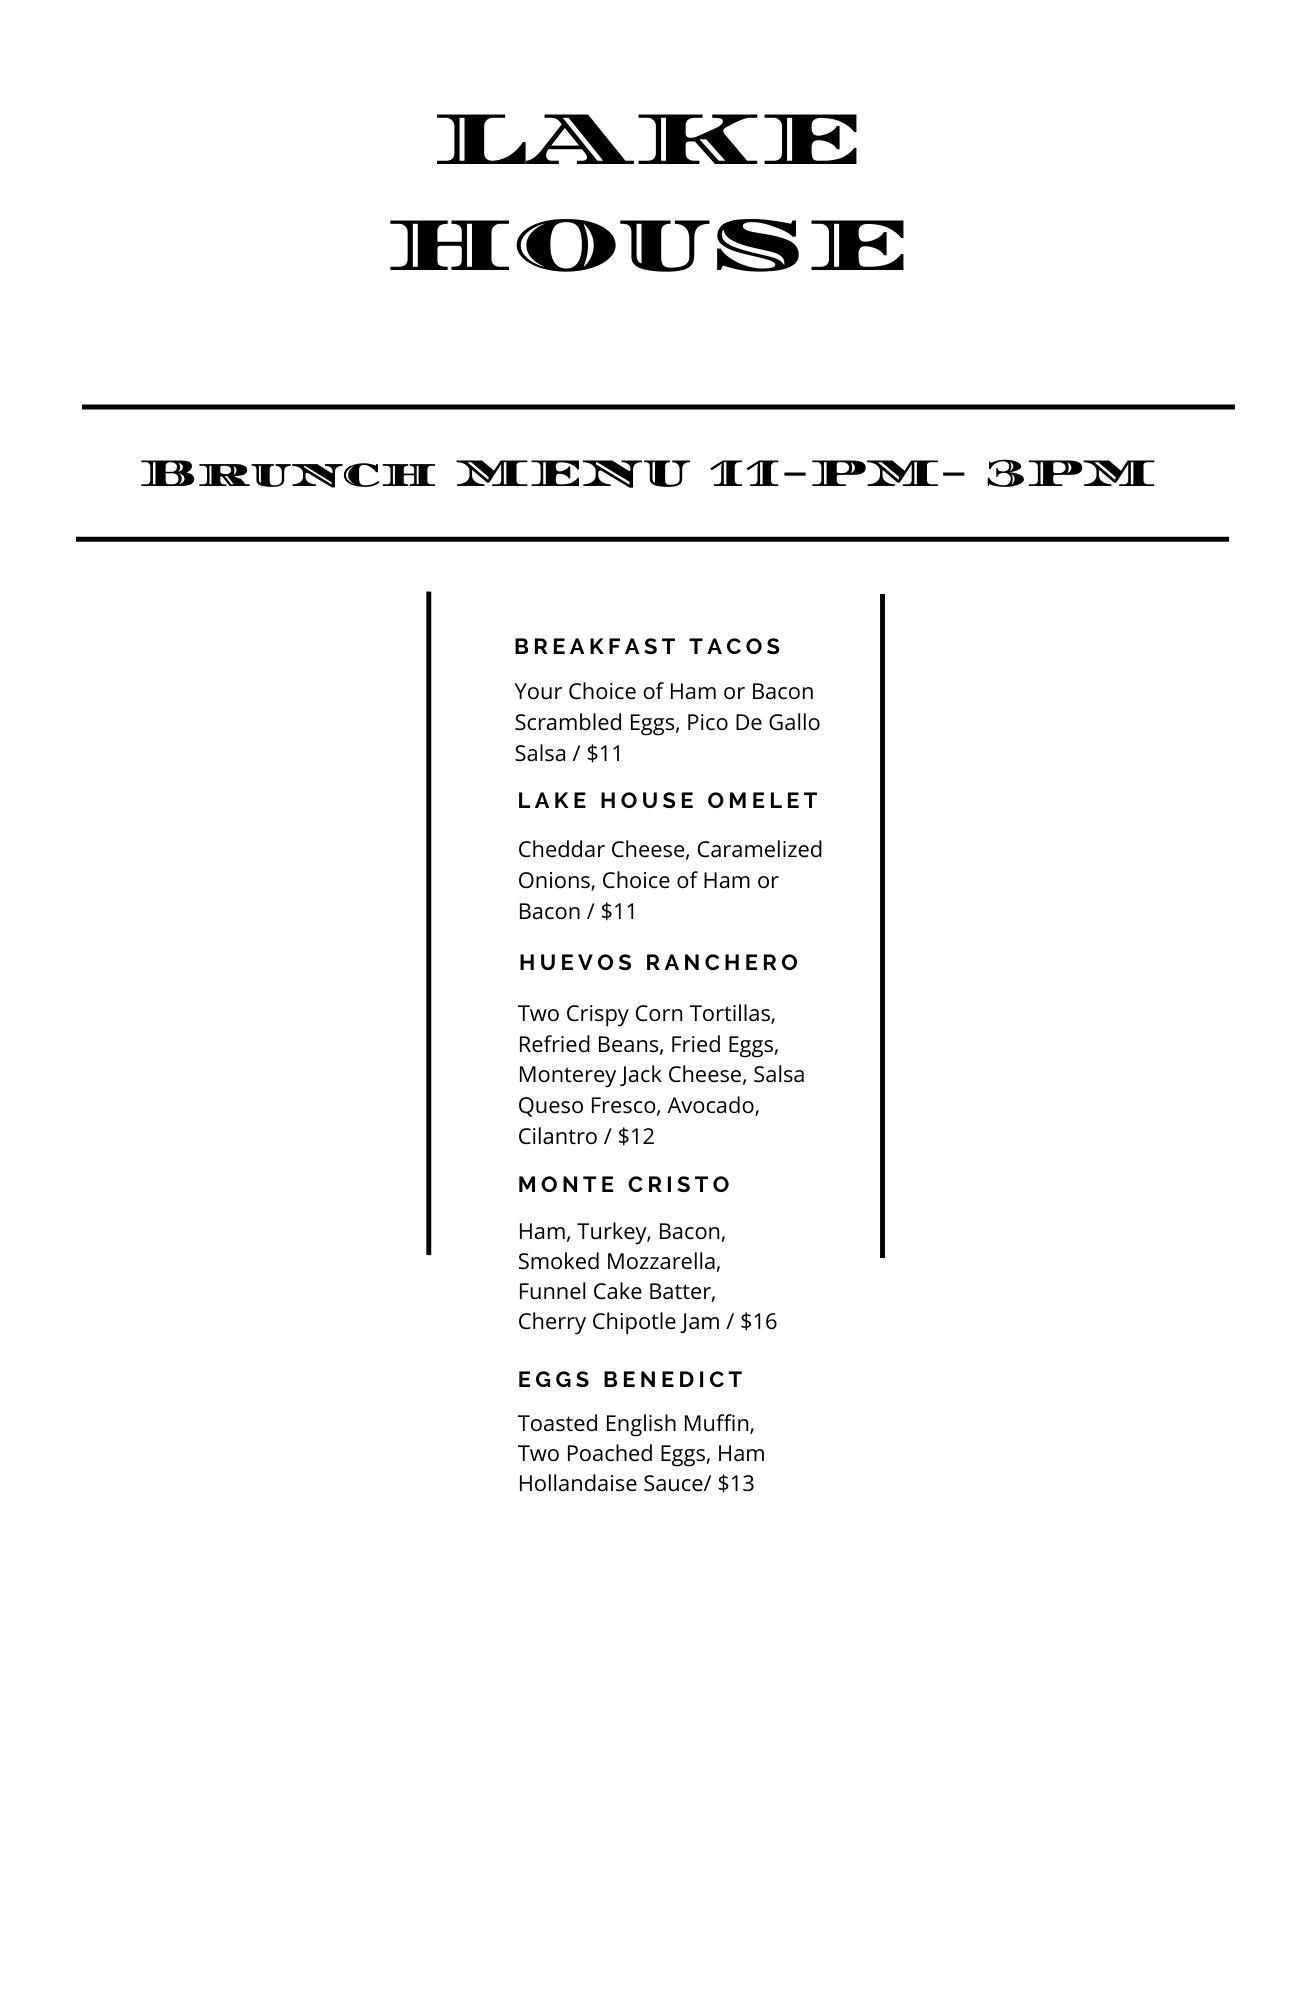 Brunch Menu  6-23 (6)